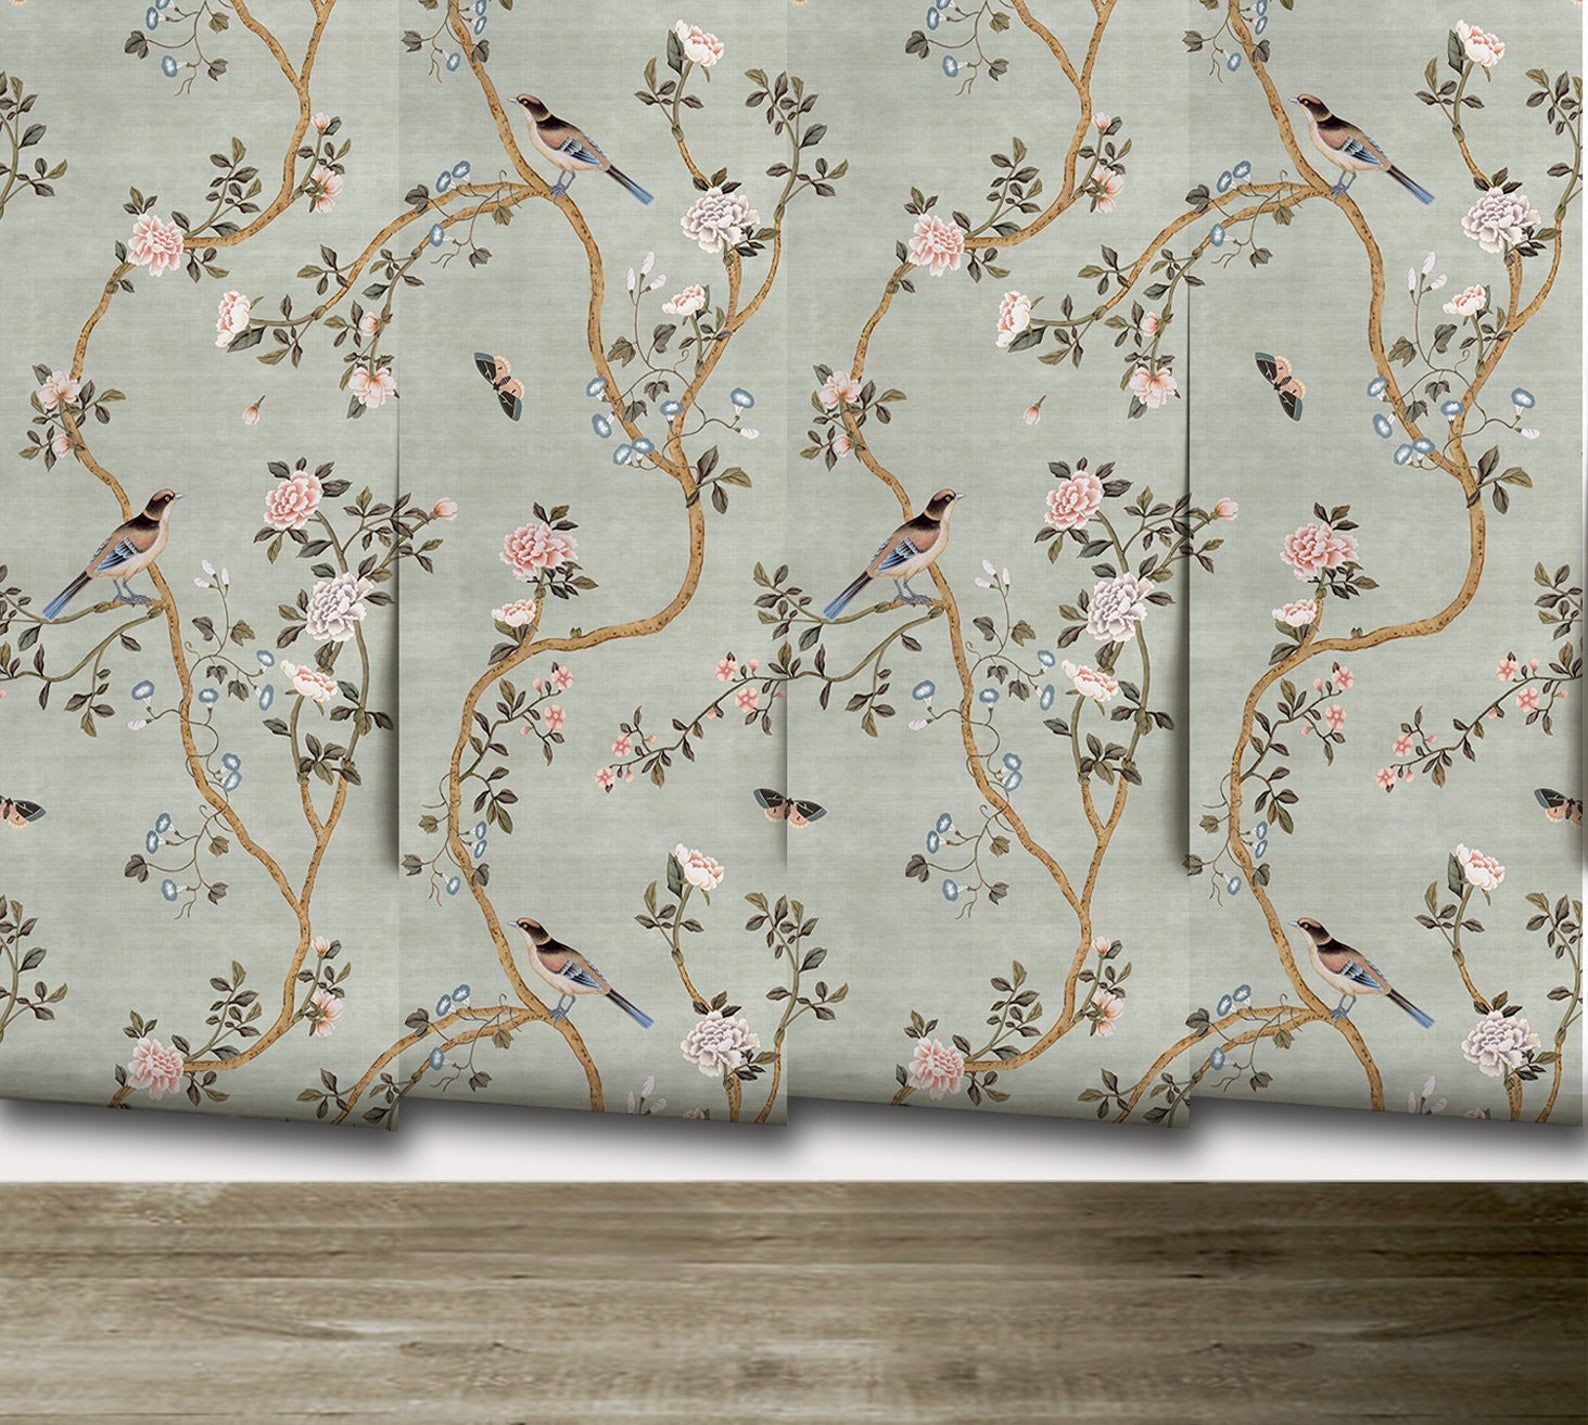 New Avignon Chinoiserie Peel N Stick Or Prepasted Etsy In 2021 Chinoiserie Vintage Bird Wallpaper Chinoiserie Wallpaper